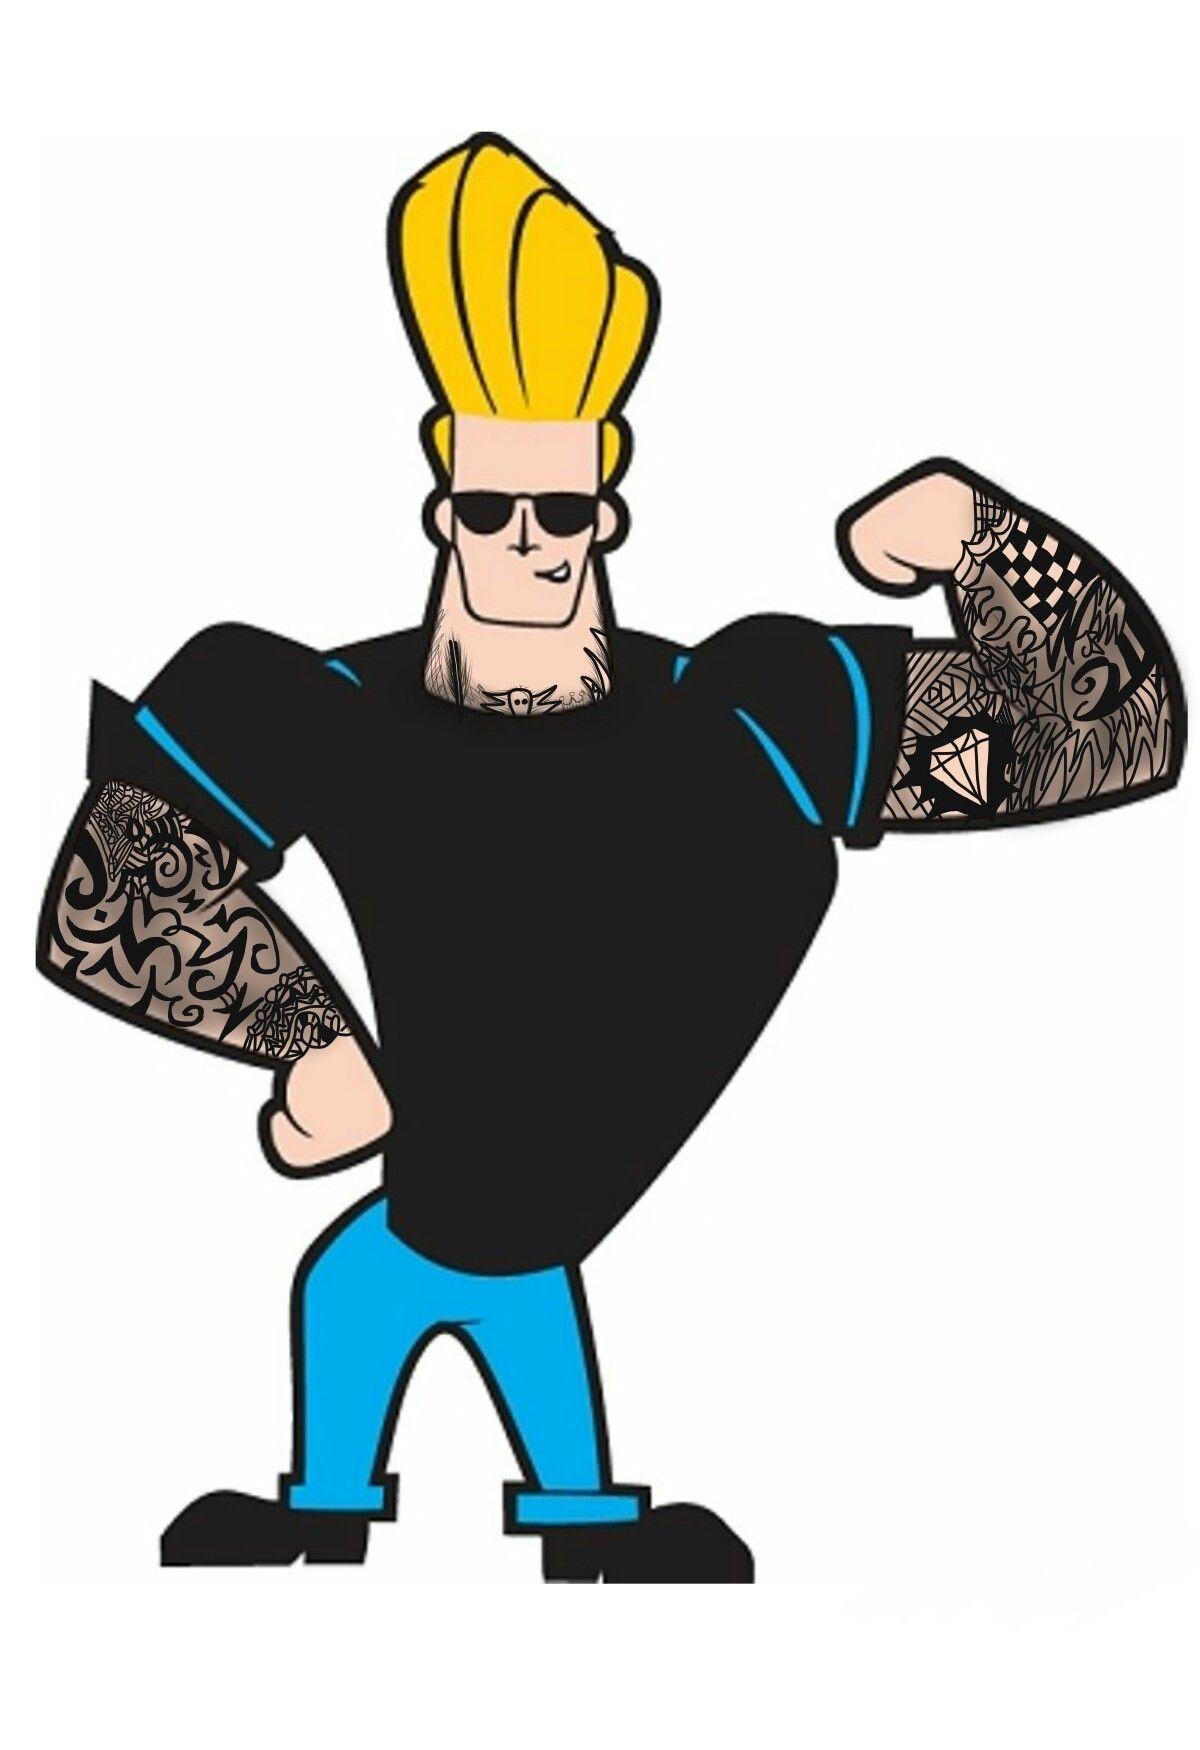 Johnny Bravo With Tattoos By Jawairiya In 2021 Johnny Bravo Cartoon Johnny Bravo Cartoon Photo